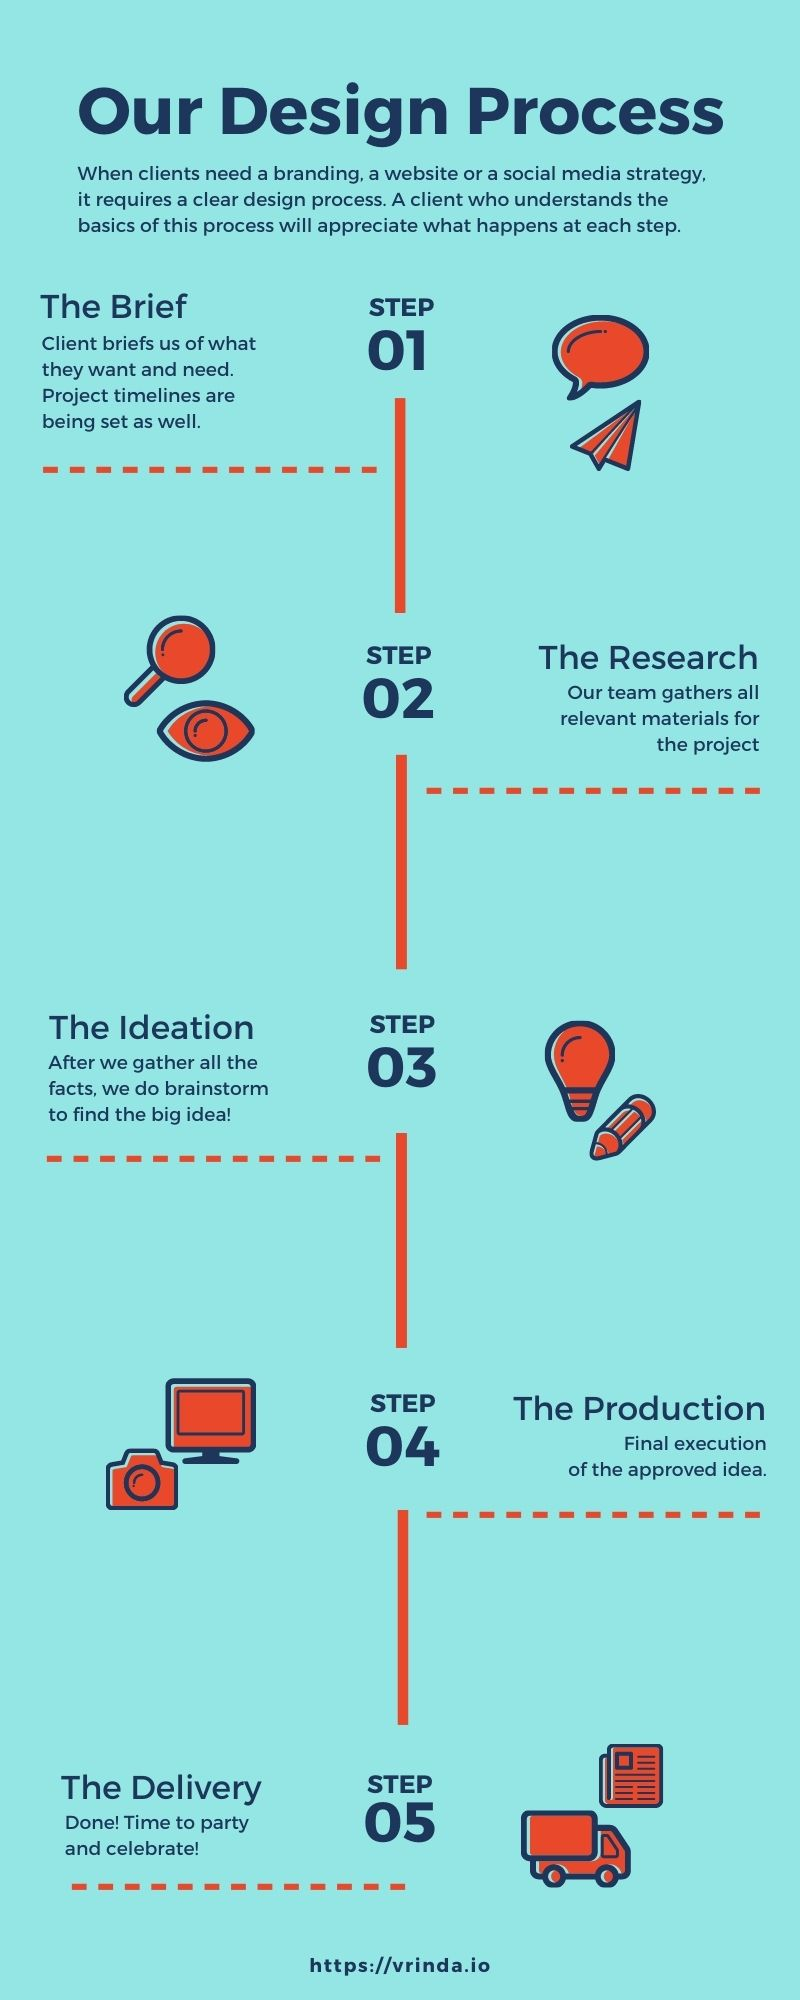 Digitl Marketing Work Design Process   Vrinda Techapps